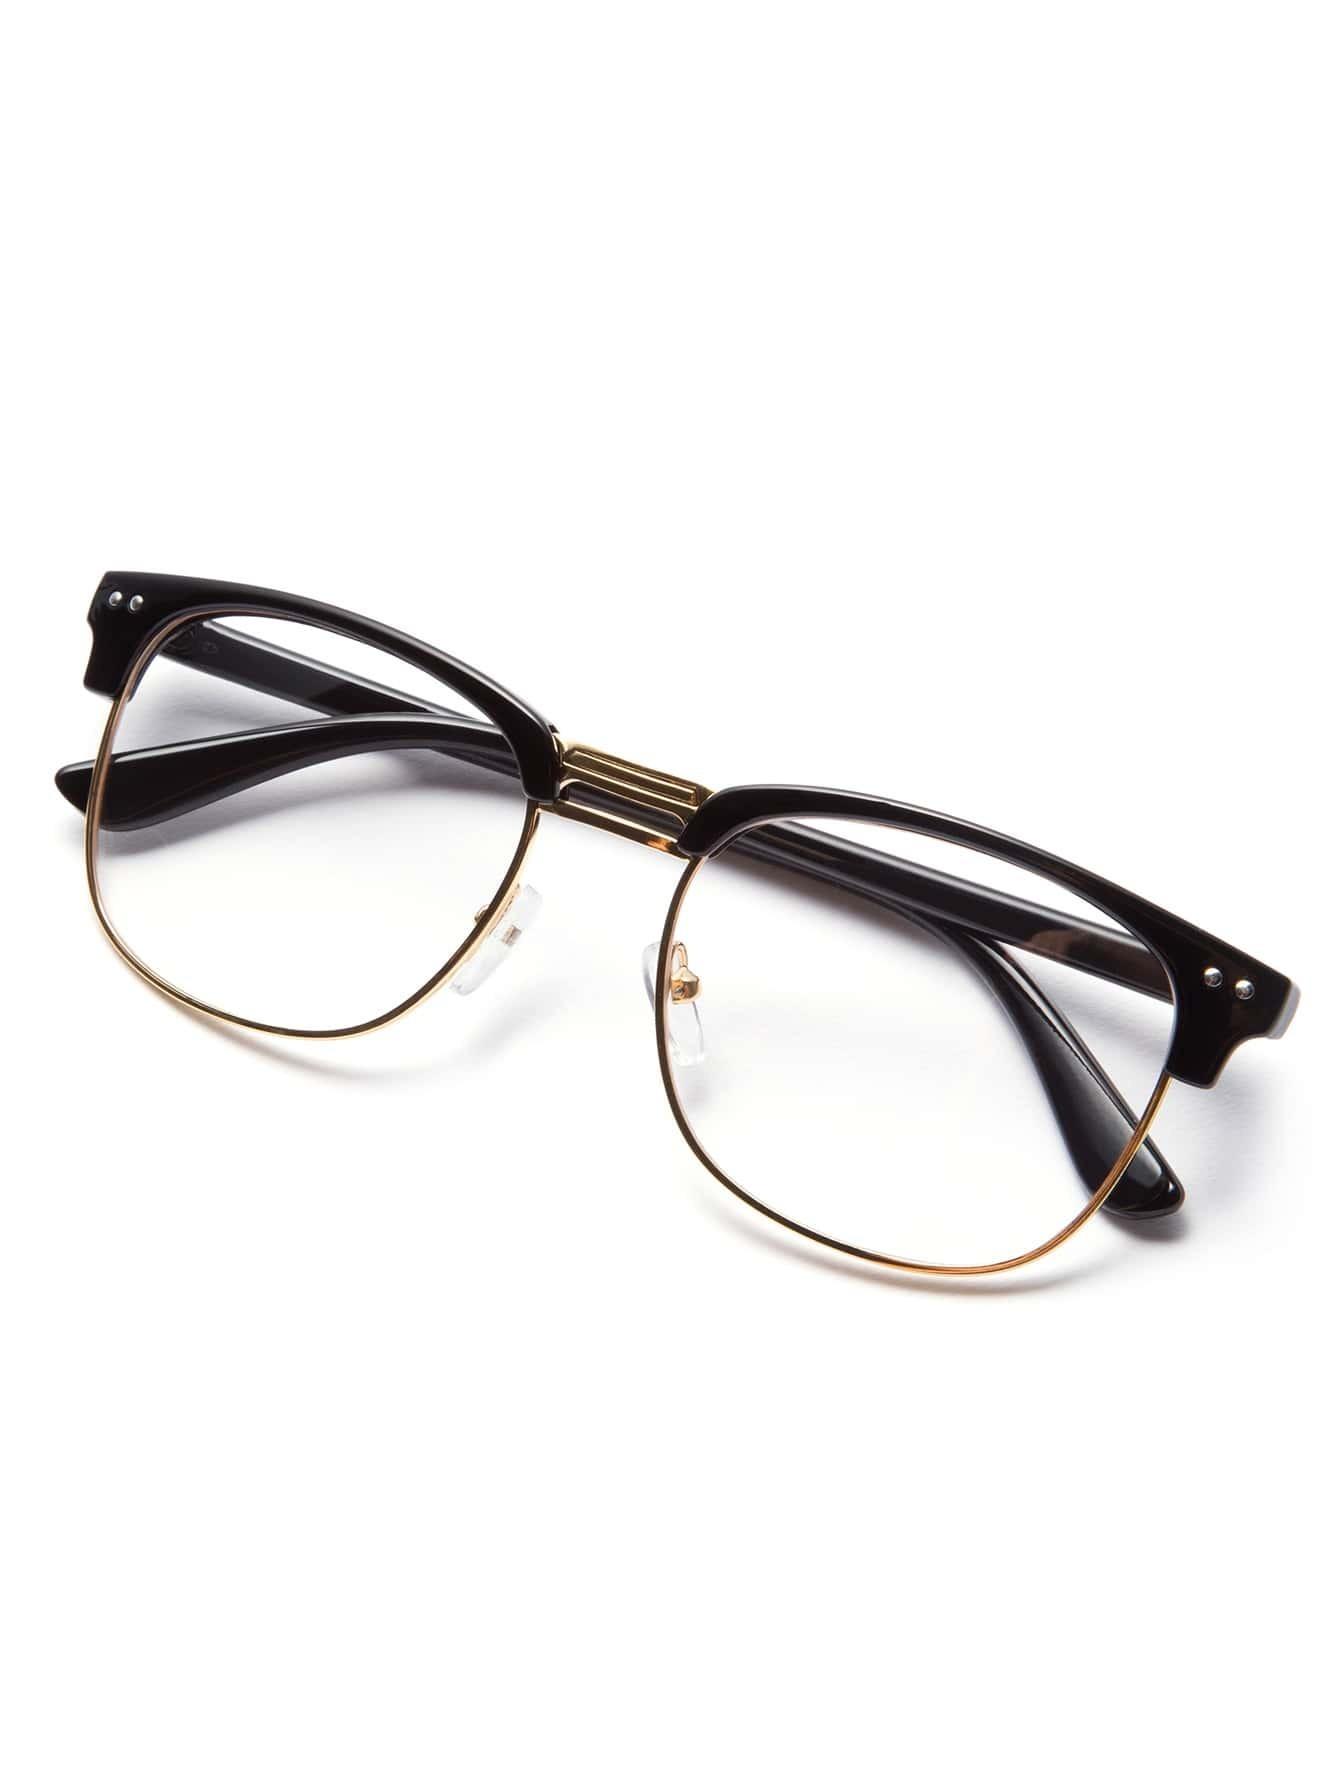 Black Frame Glasses With Gold : Black Open Frame Gold Trim Glasses